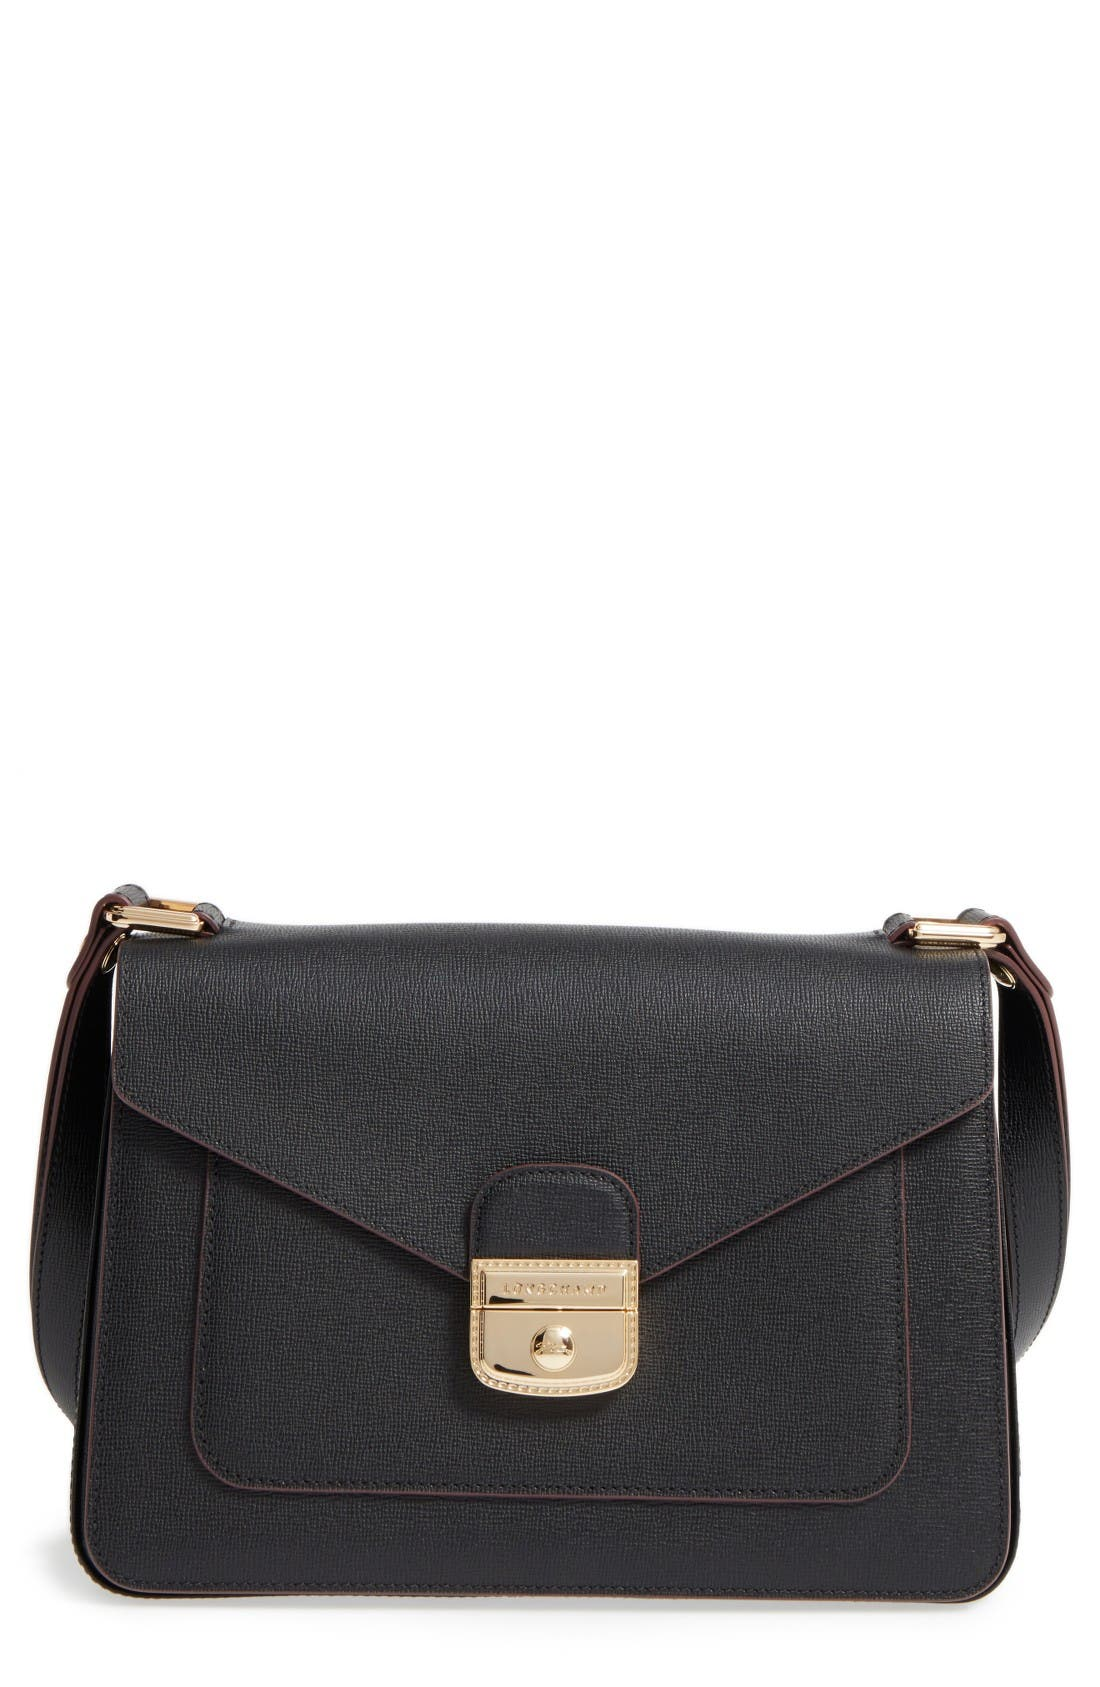 Main Image - Longchamp Pliage Heritage Leather Shoulder Bag